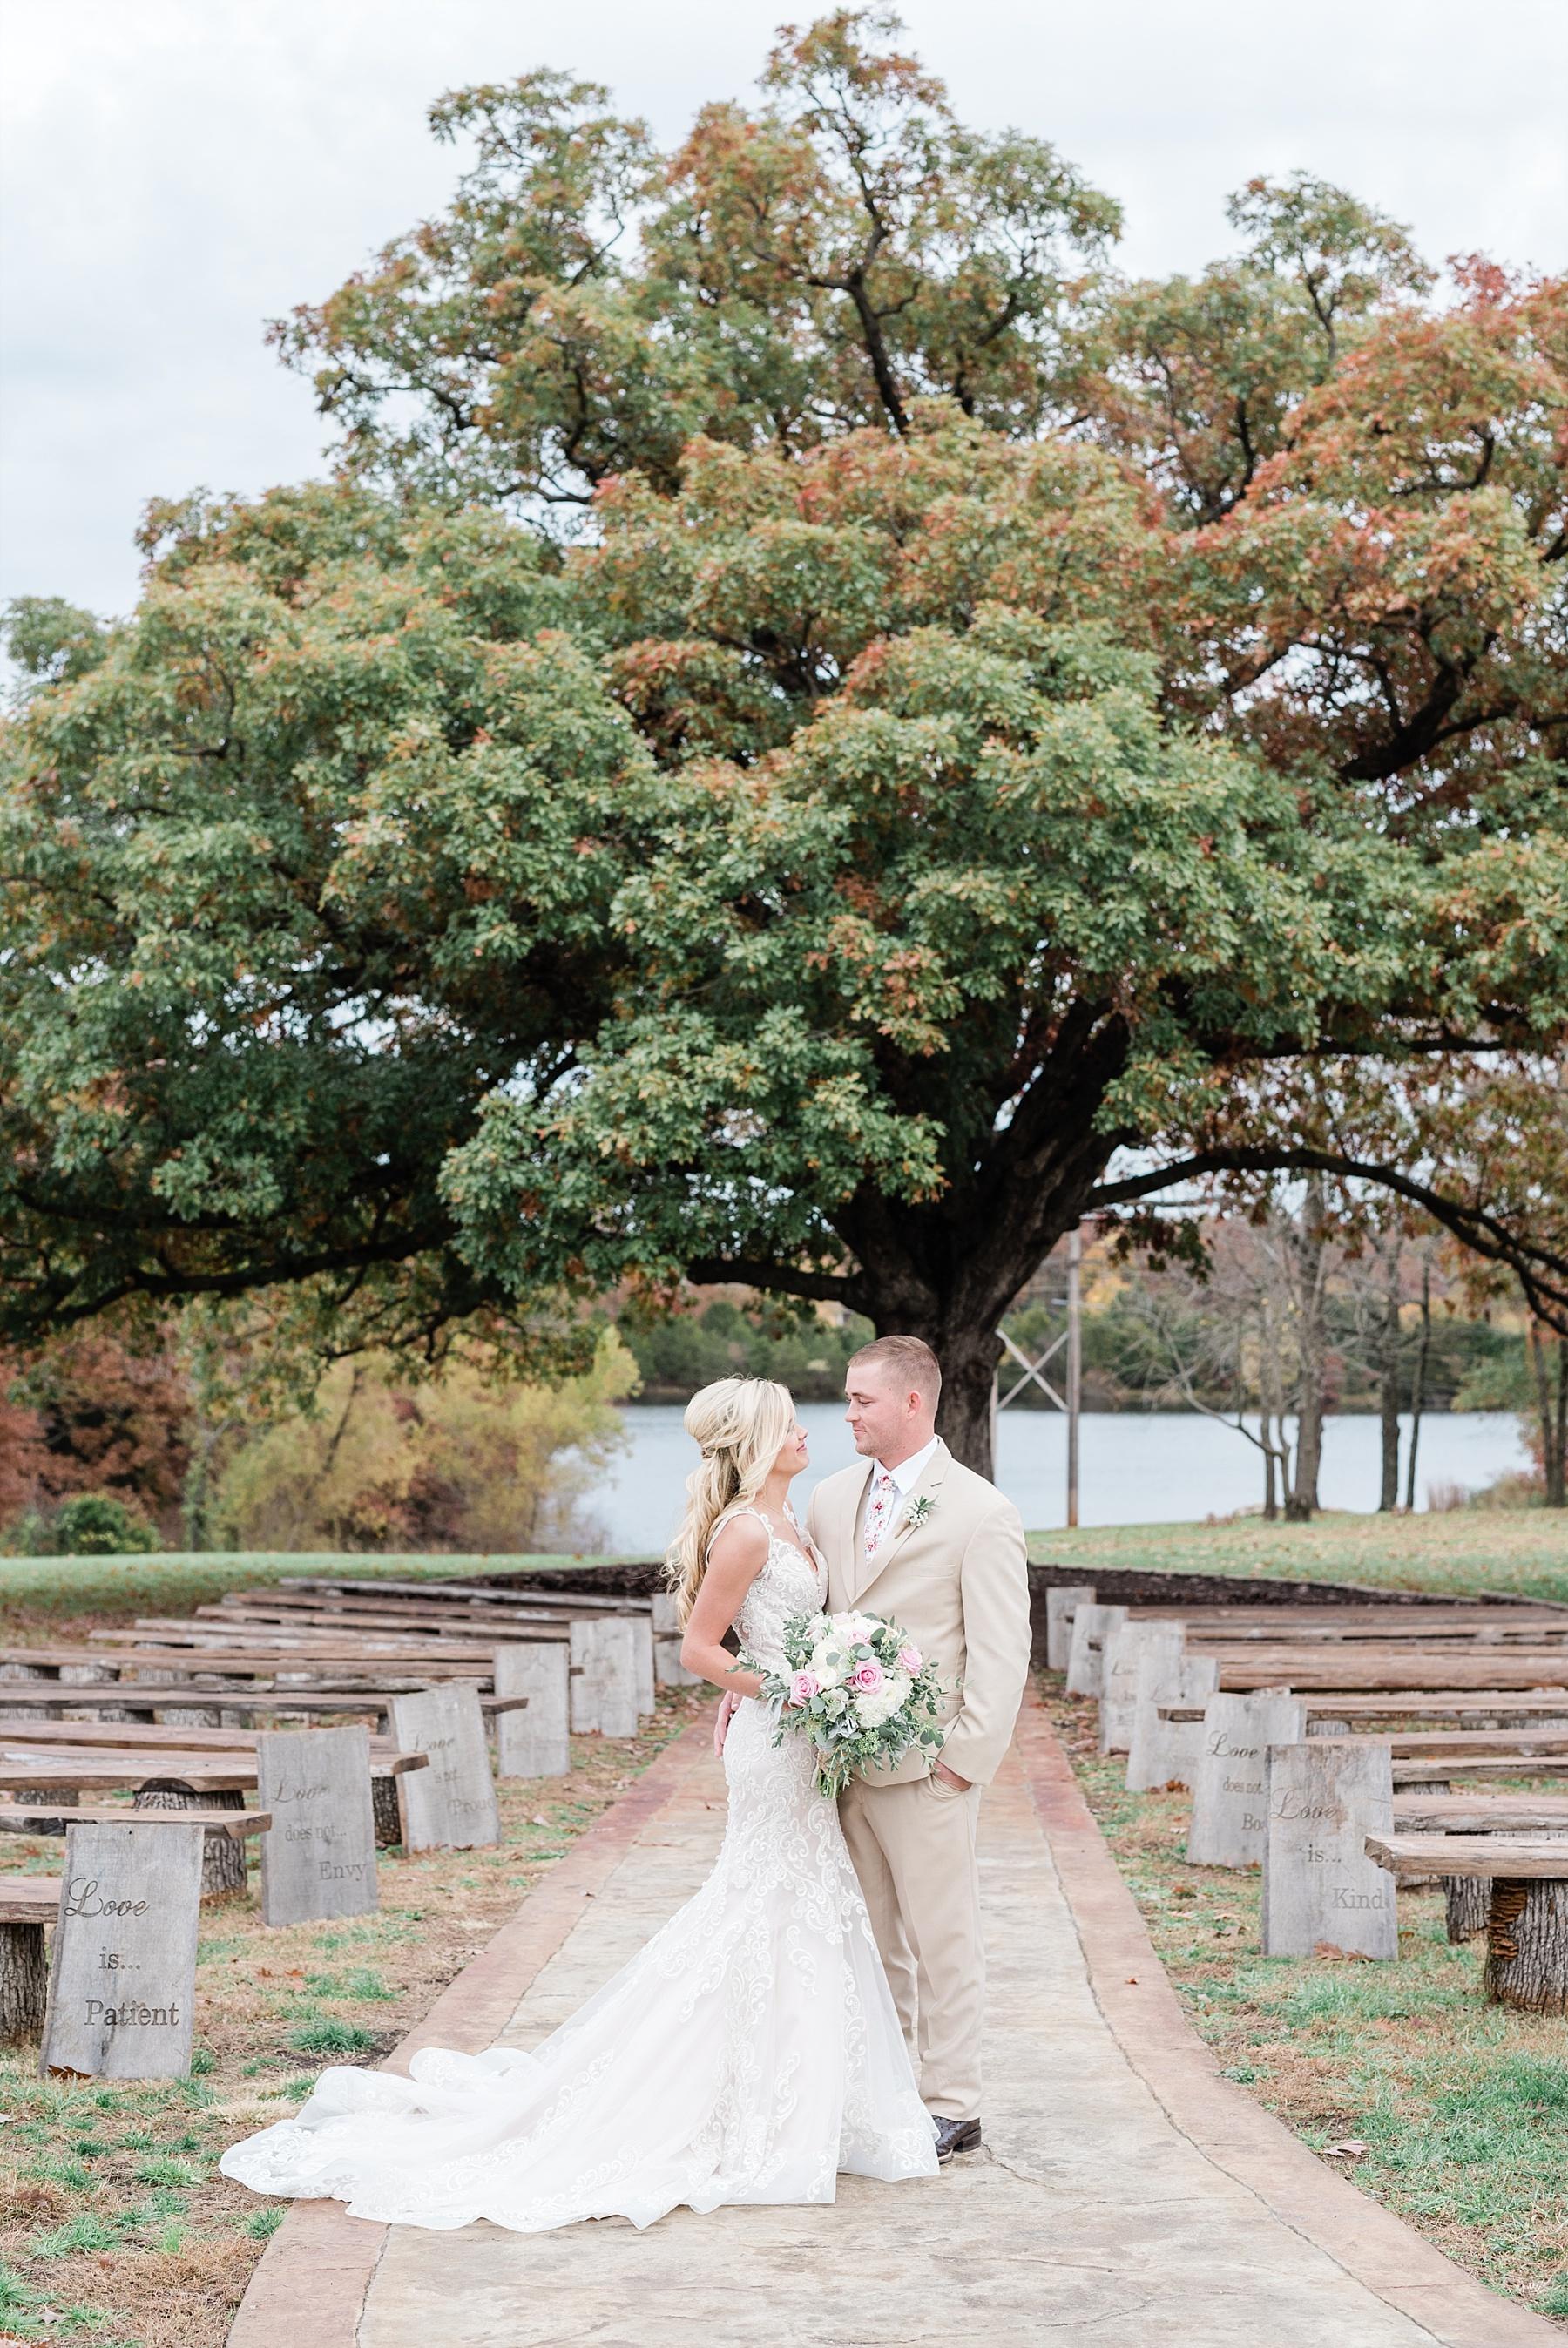 Lakeside Wedding in Fall at Mighty Oak Lodge by Misouri Wedding Photographer Kelsi Kliethermes Photography_0039.jpg